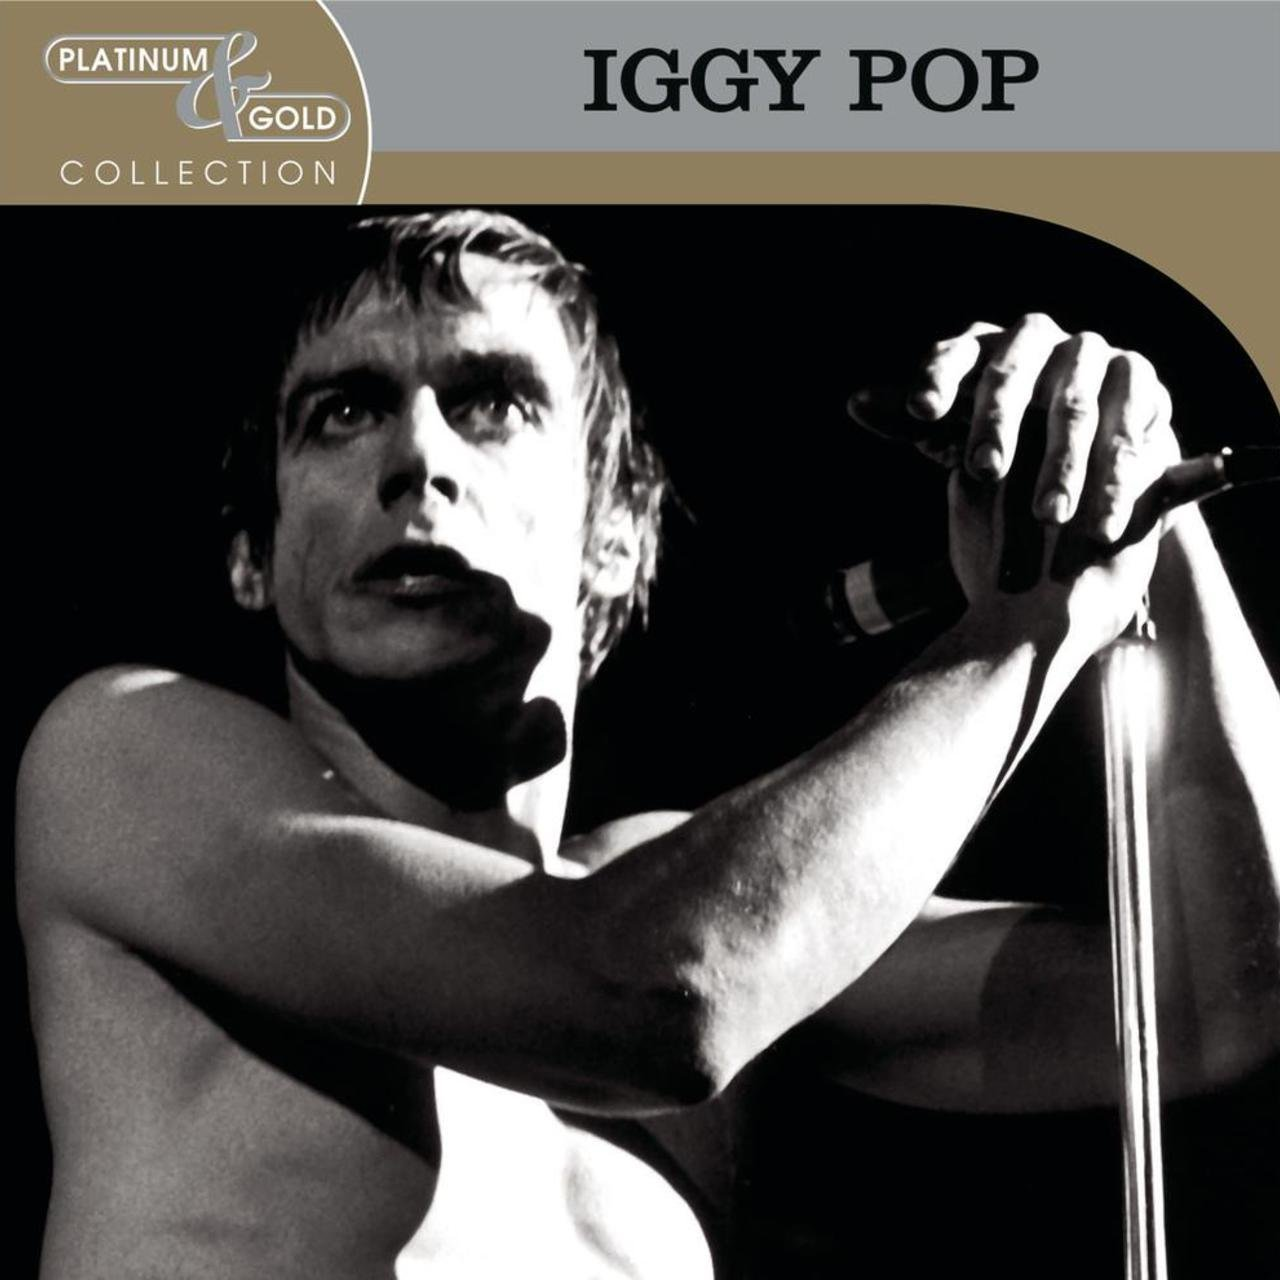 Iggy Pop Album Covers Great platinum & gold collection / iggy pop tidal